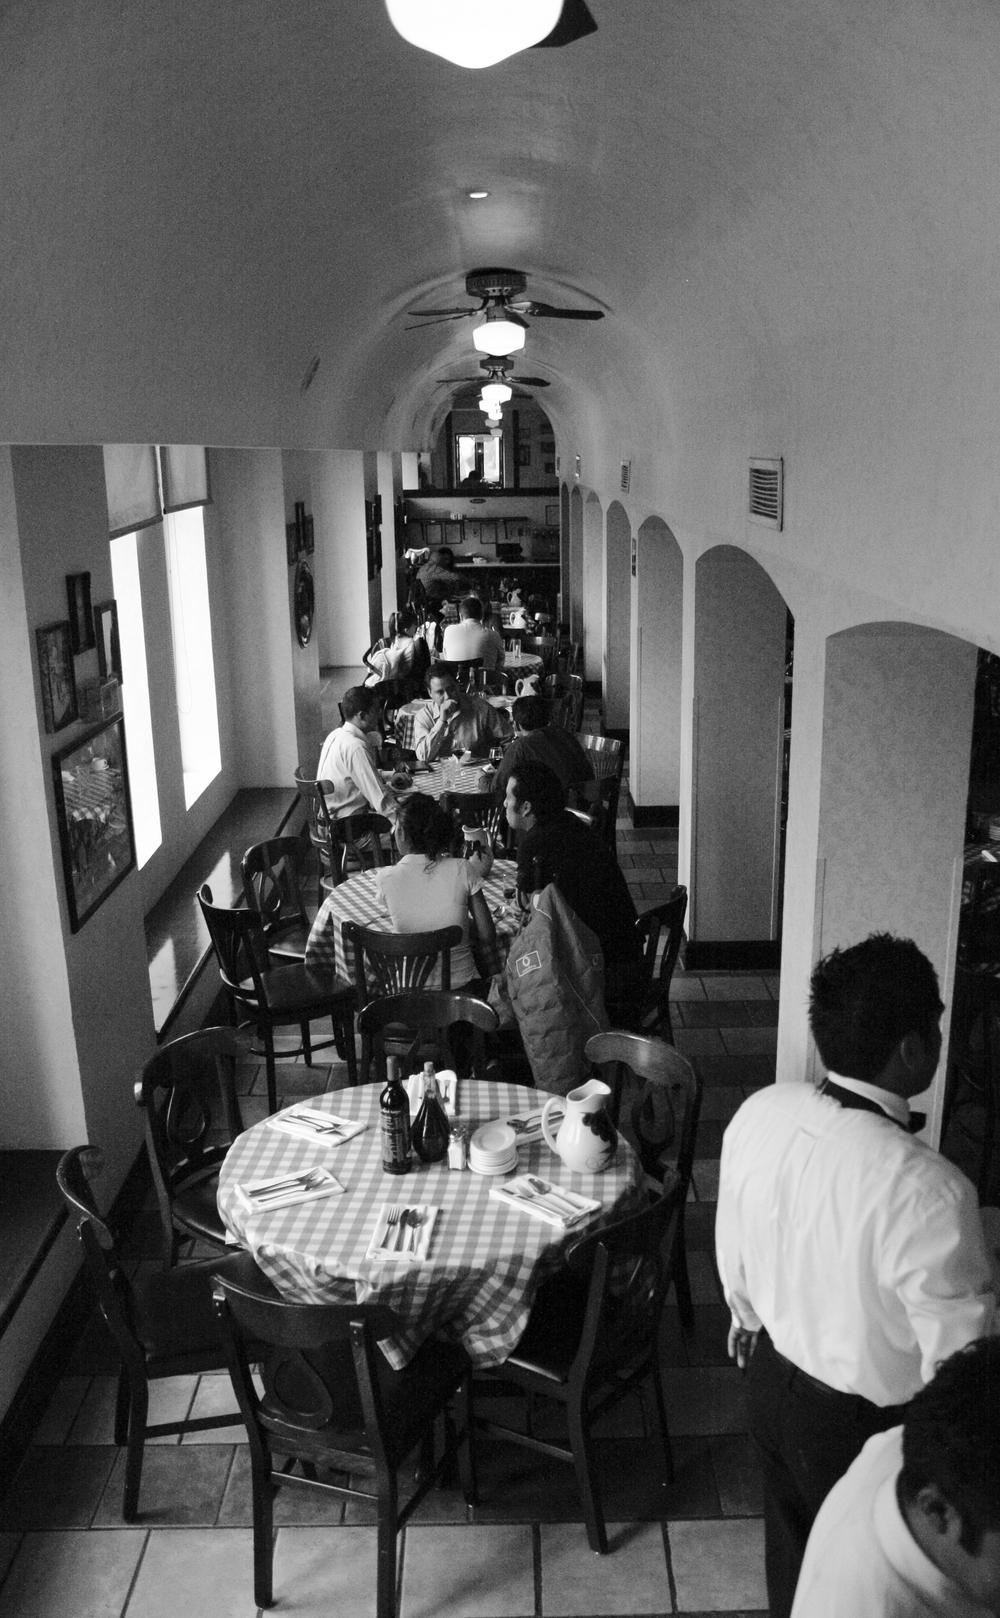 Italianni's en Famiglia